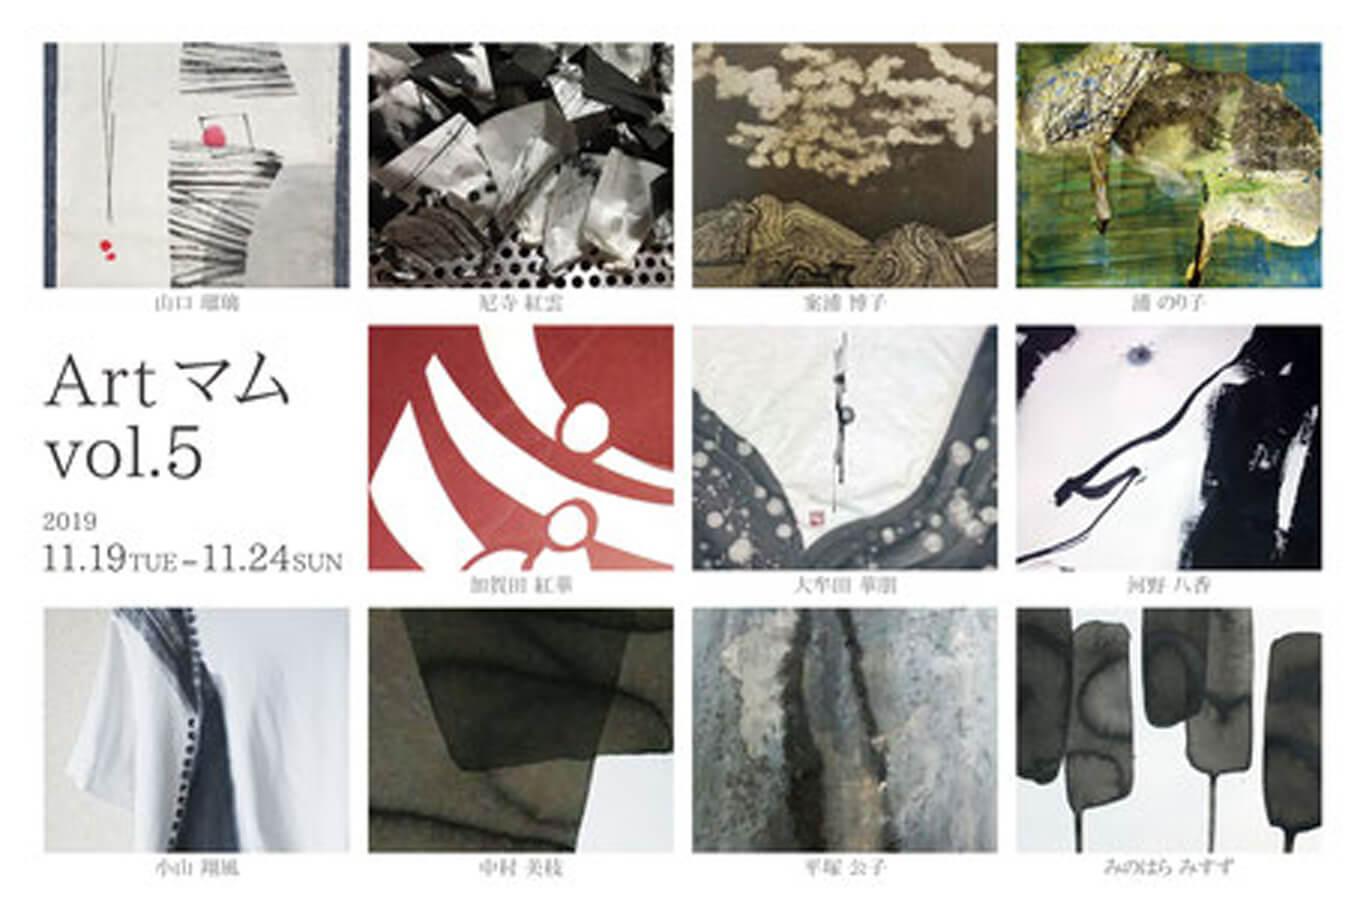 enlc-201911-Art マム-展覧会